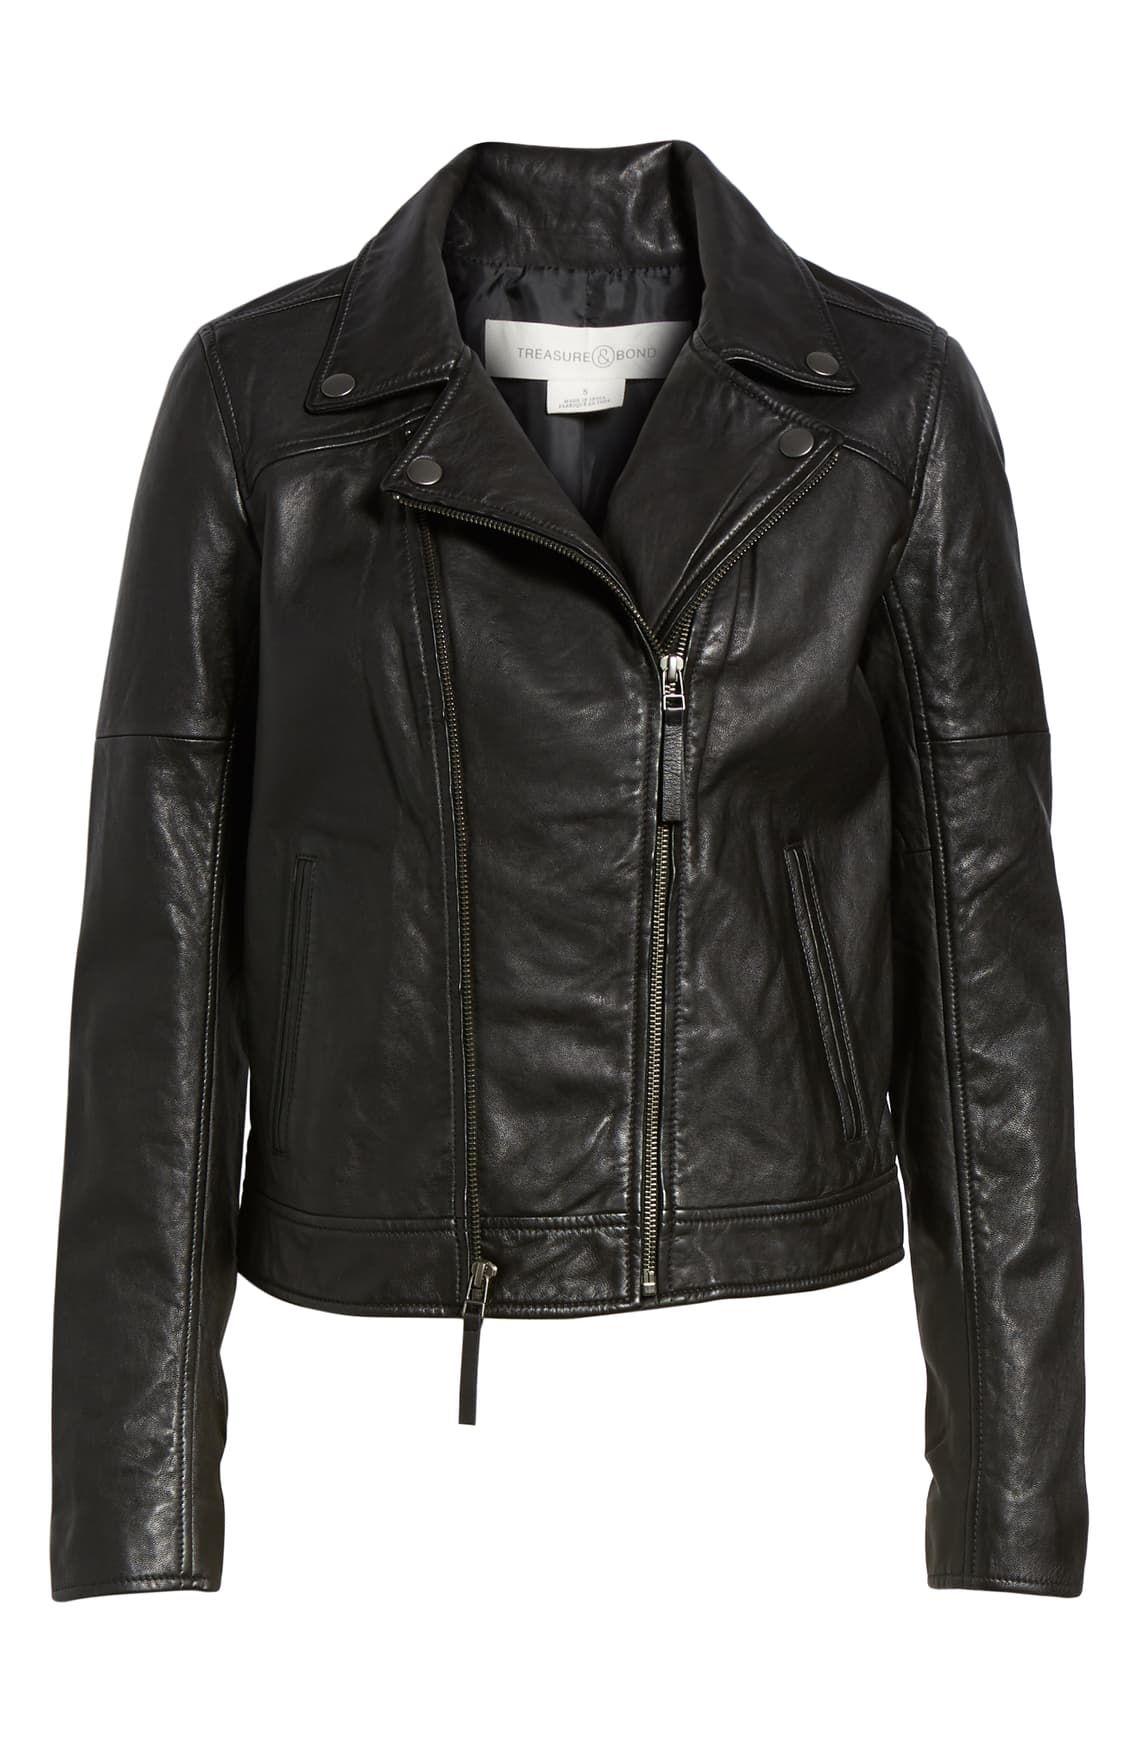 Treasure & Bond Leather Moto Jacket Nordstrom Leather